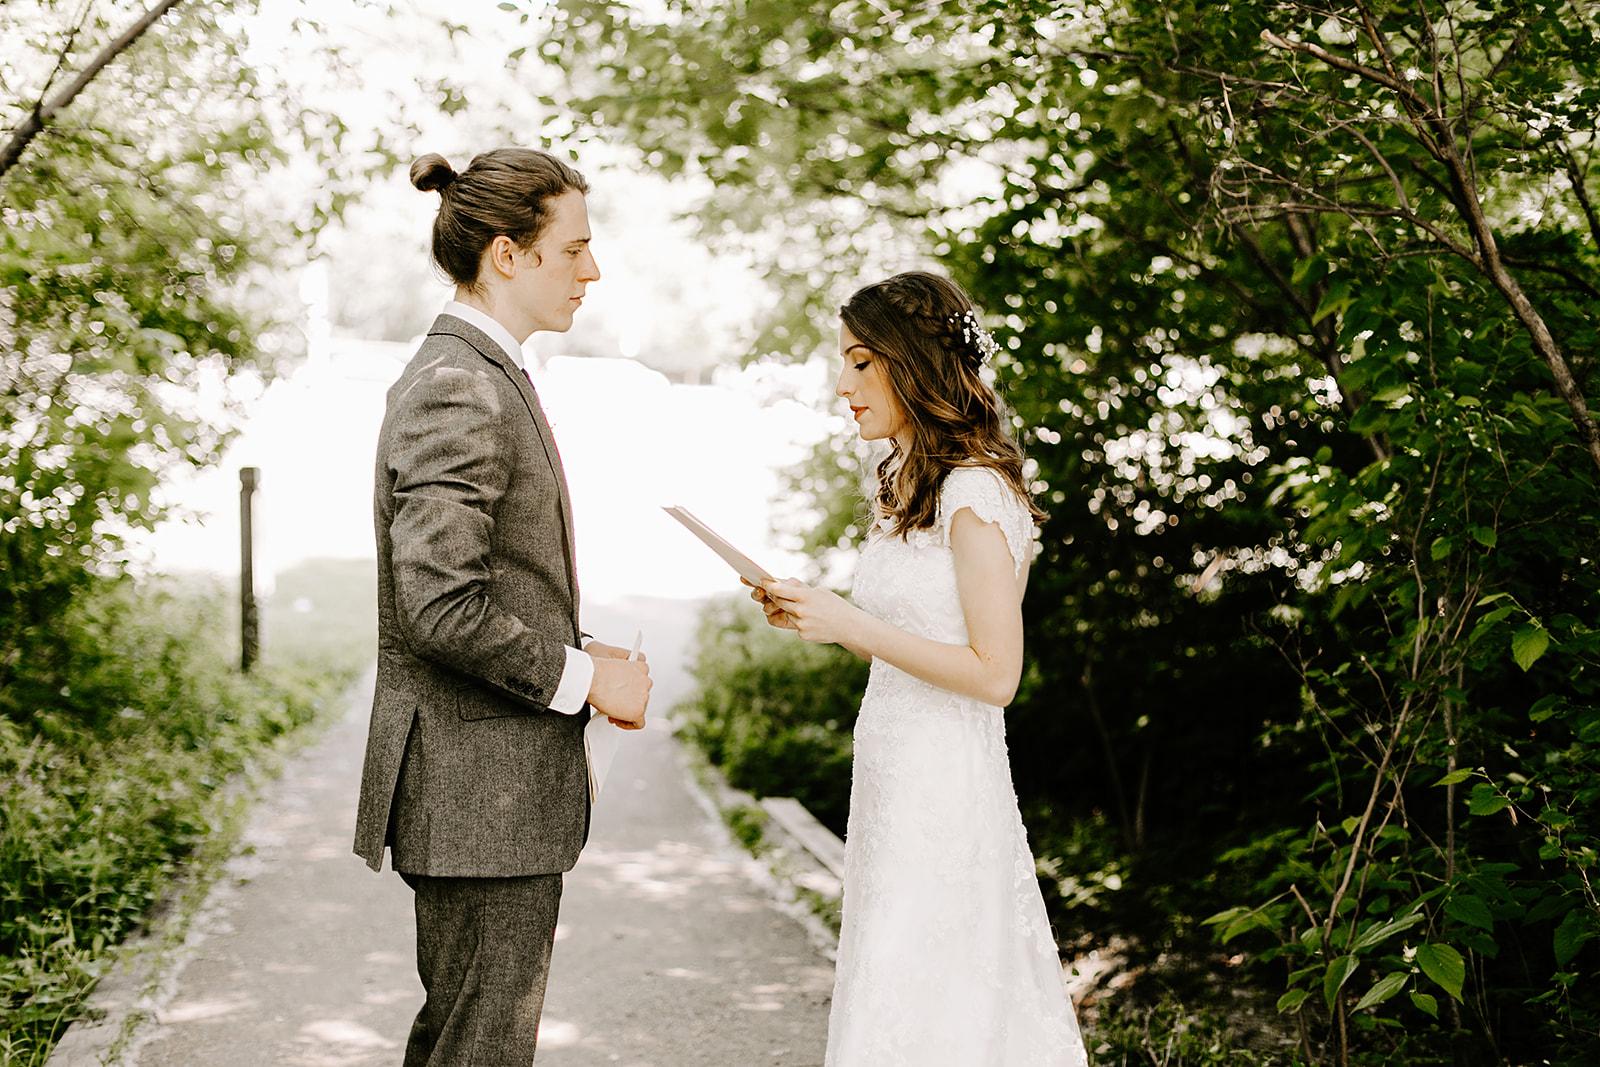 Lily and Easton Wedding Carmel Indiana Cool Creek Park Grace Church Emily Elyse Wehner Photography -99.jpg